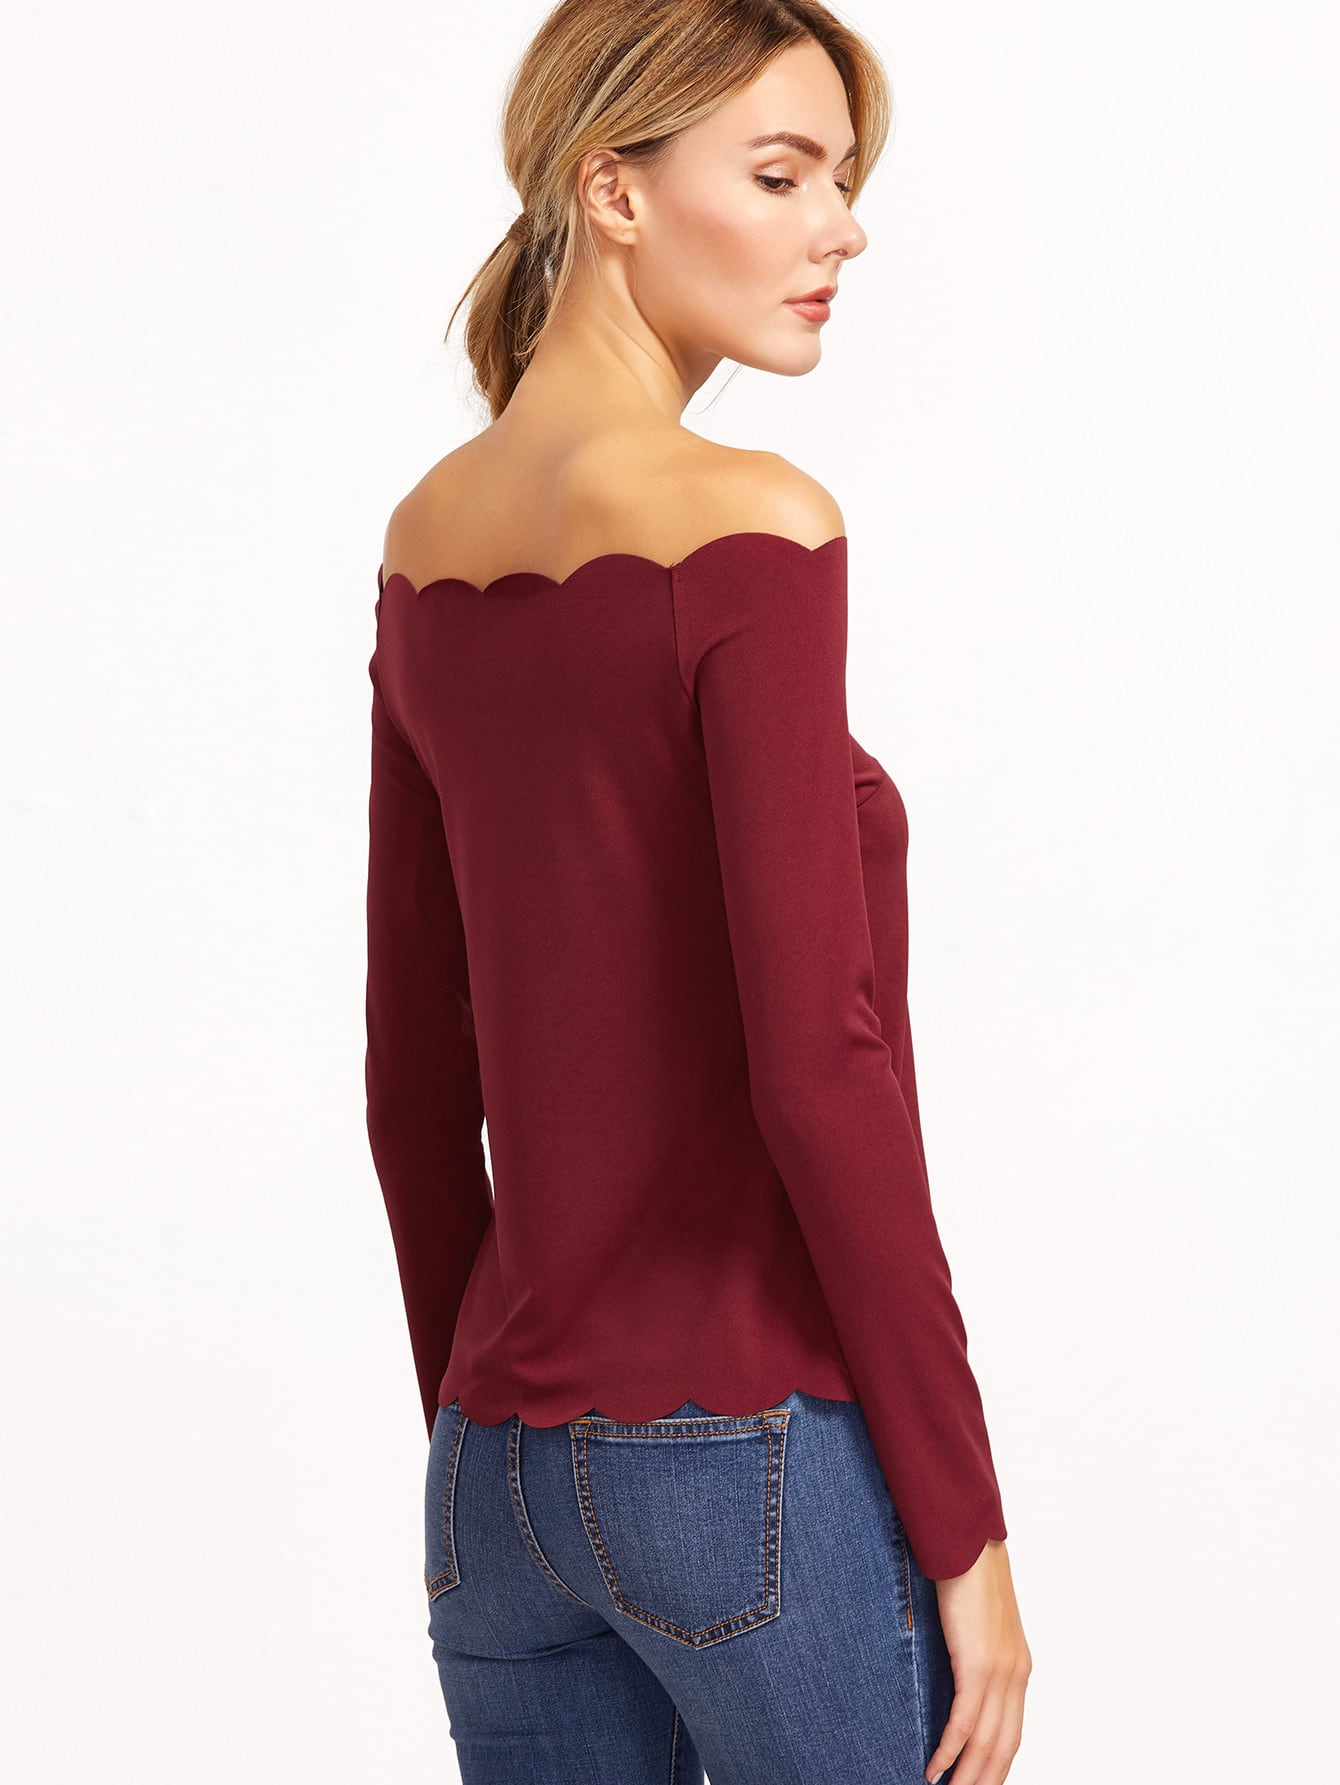 blouse161124705_2